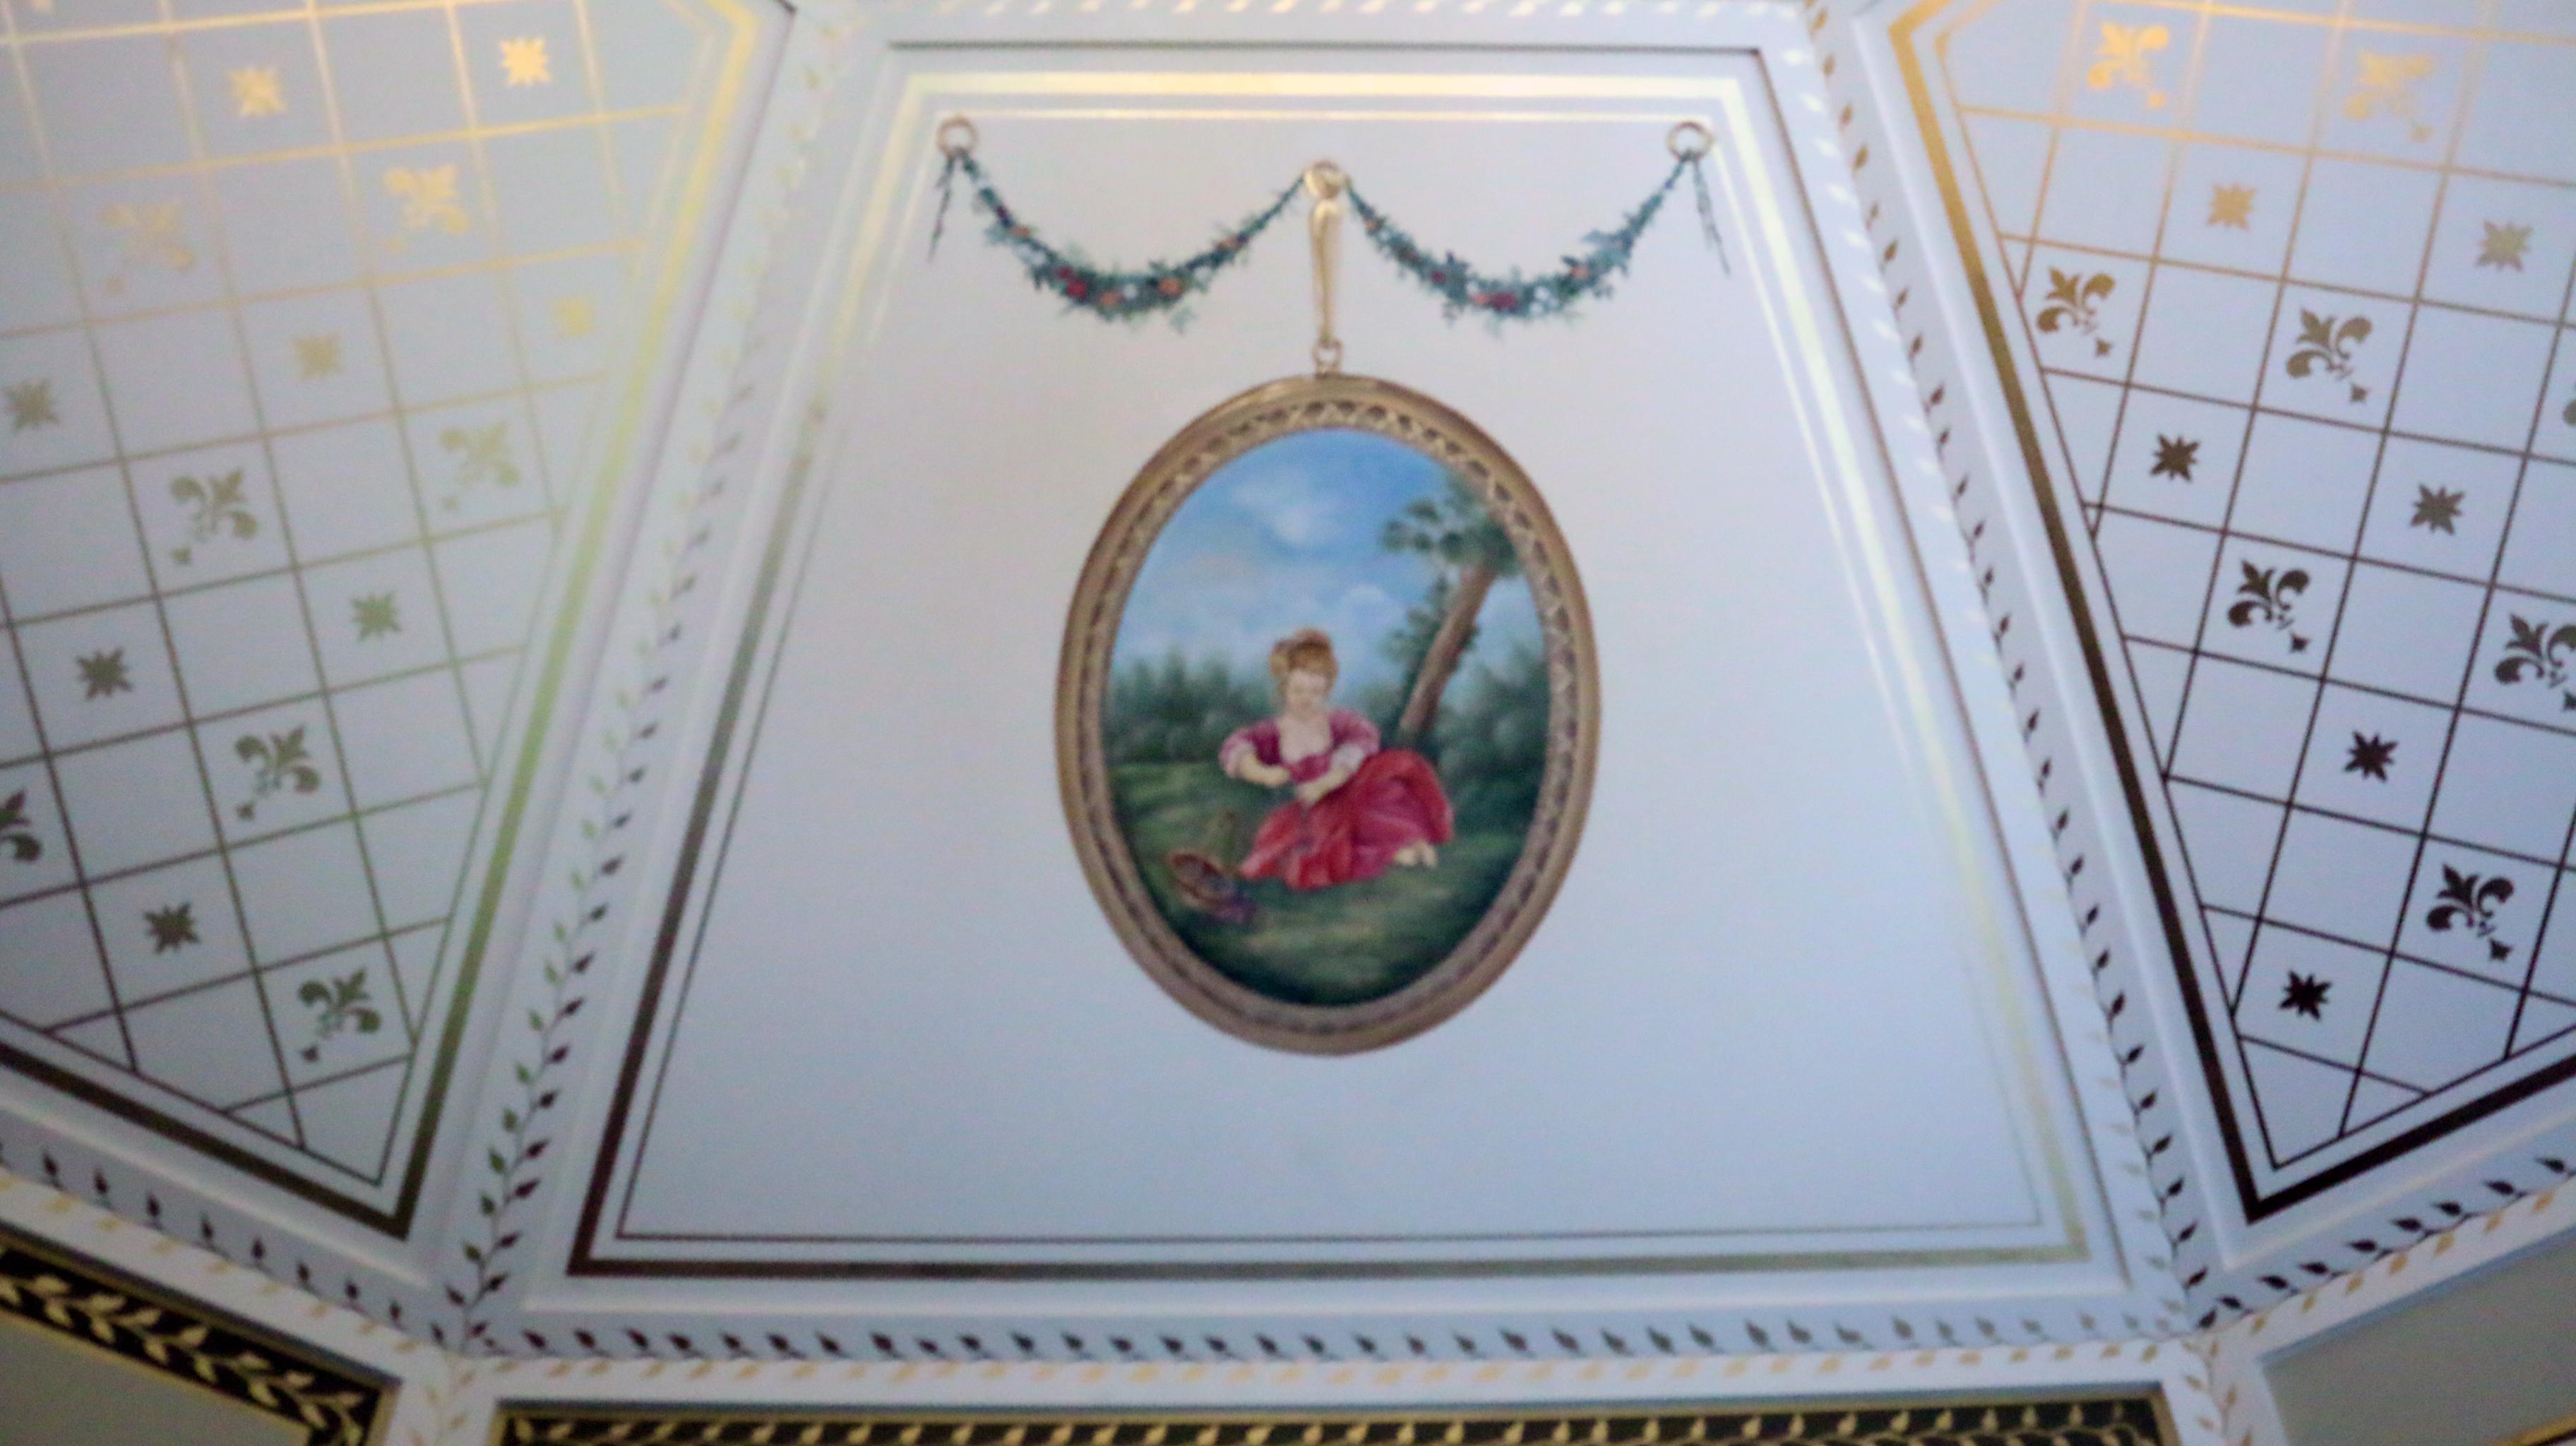 Mural & Ceiling Dome Demarest NJ